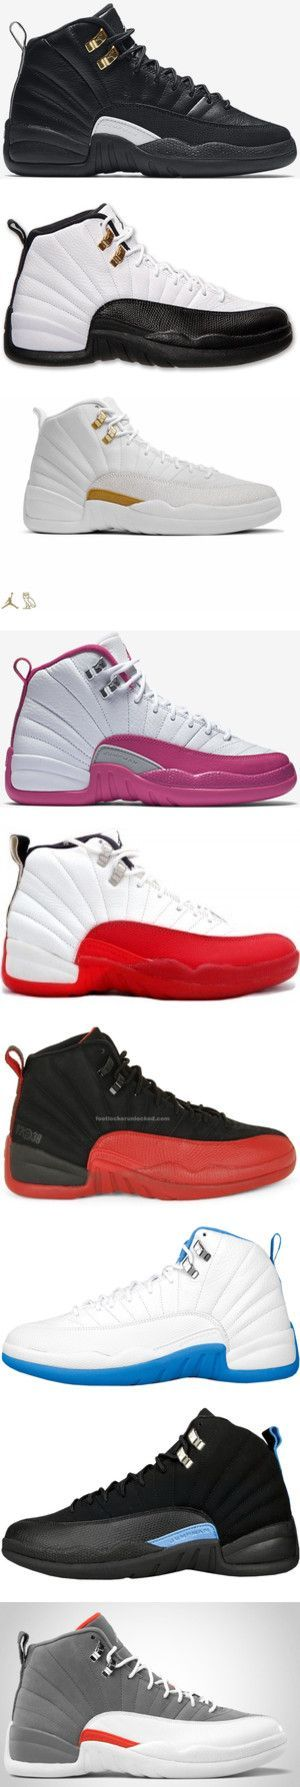 Jordan 12s by shudiamond on Polyvore featuring shoes, sneakers, jordans, 12s, air jordan 12 and jordan